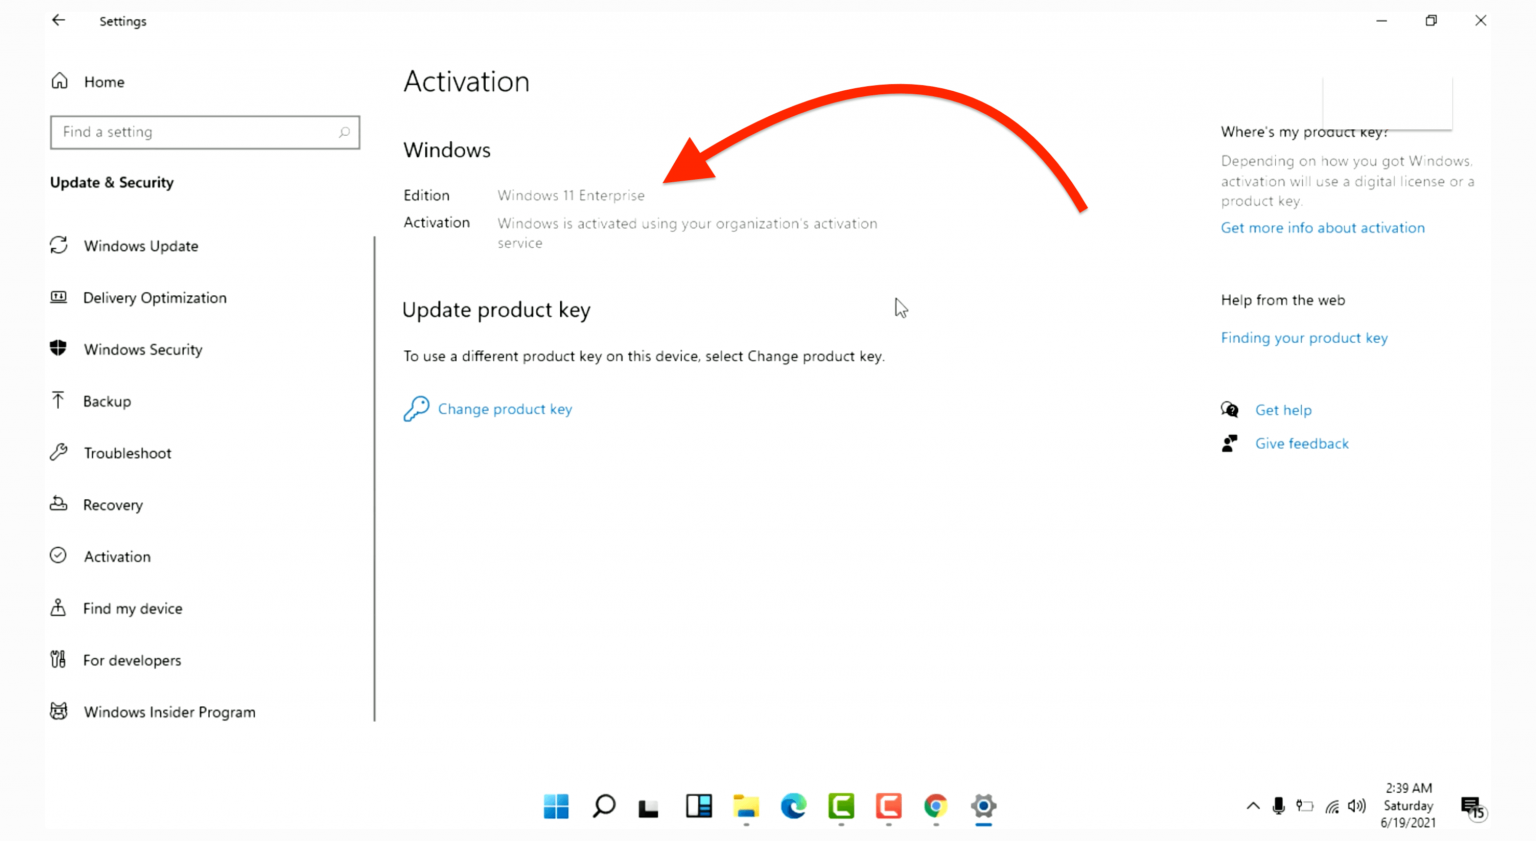 Download Windows 11 Activator KMSPico | Free Activation Key 2021